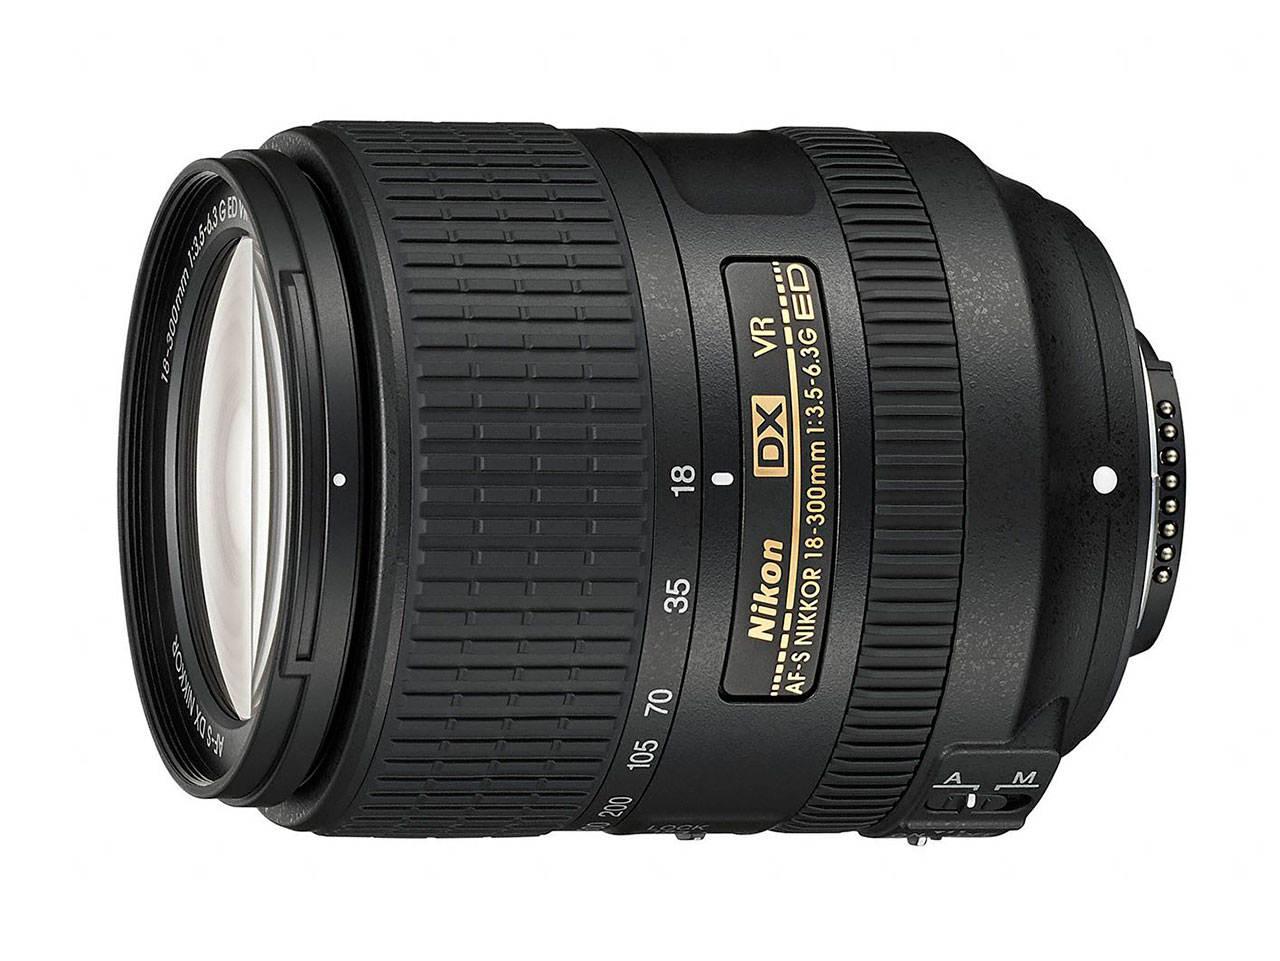 Nikon NIKKOR 18-300 мм F/3.5-6.3 ED VR